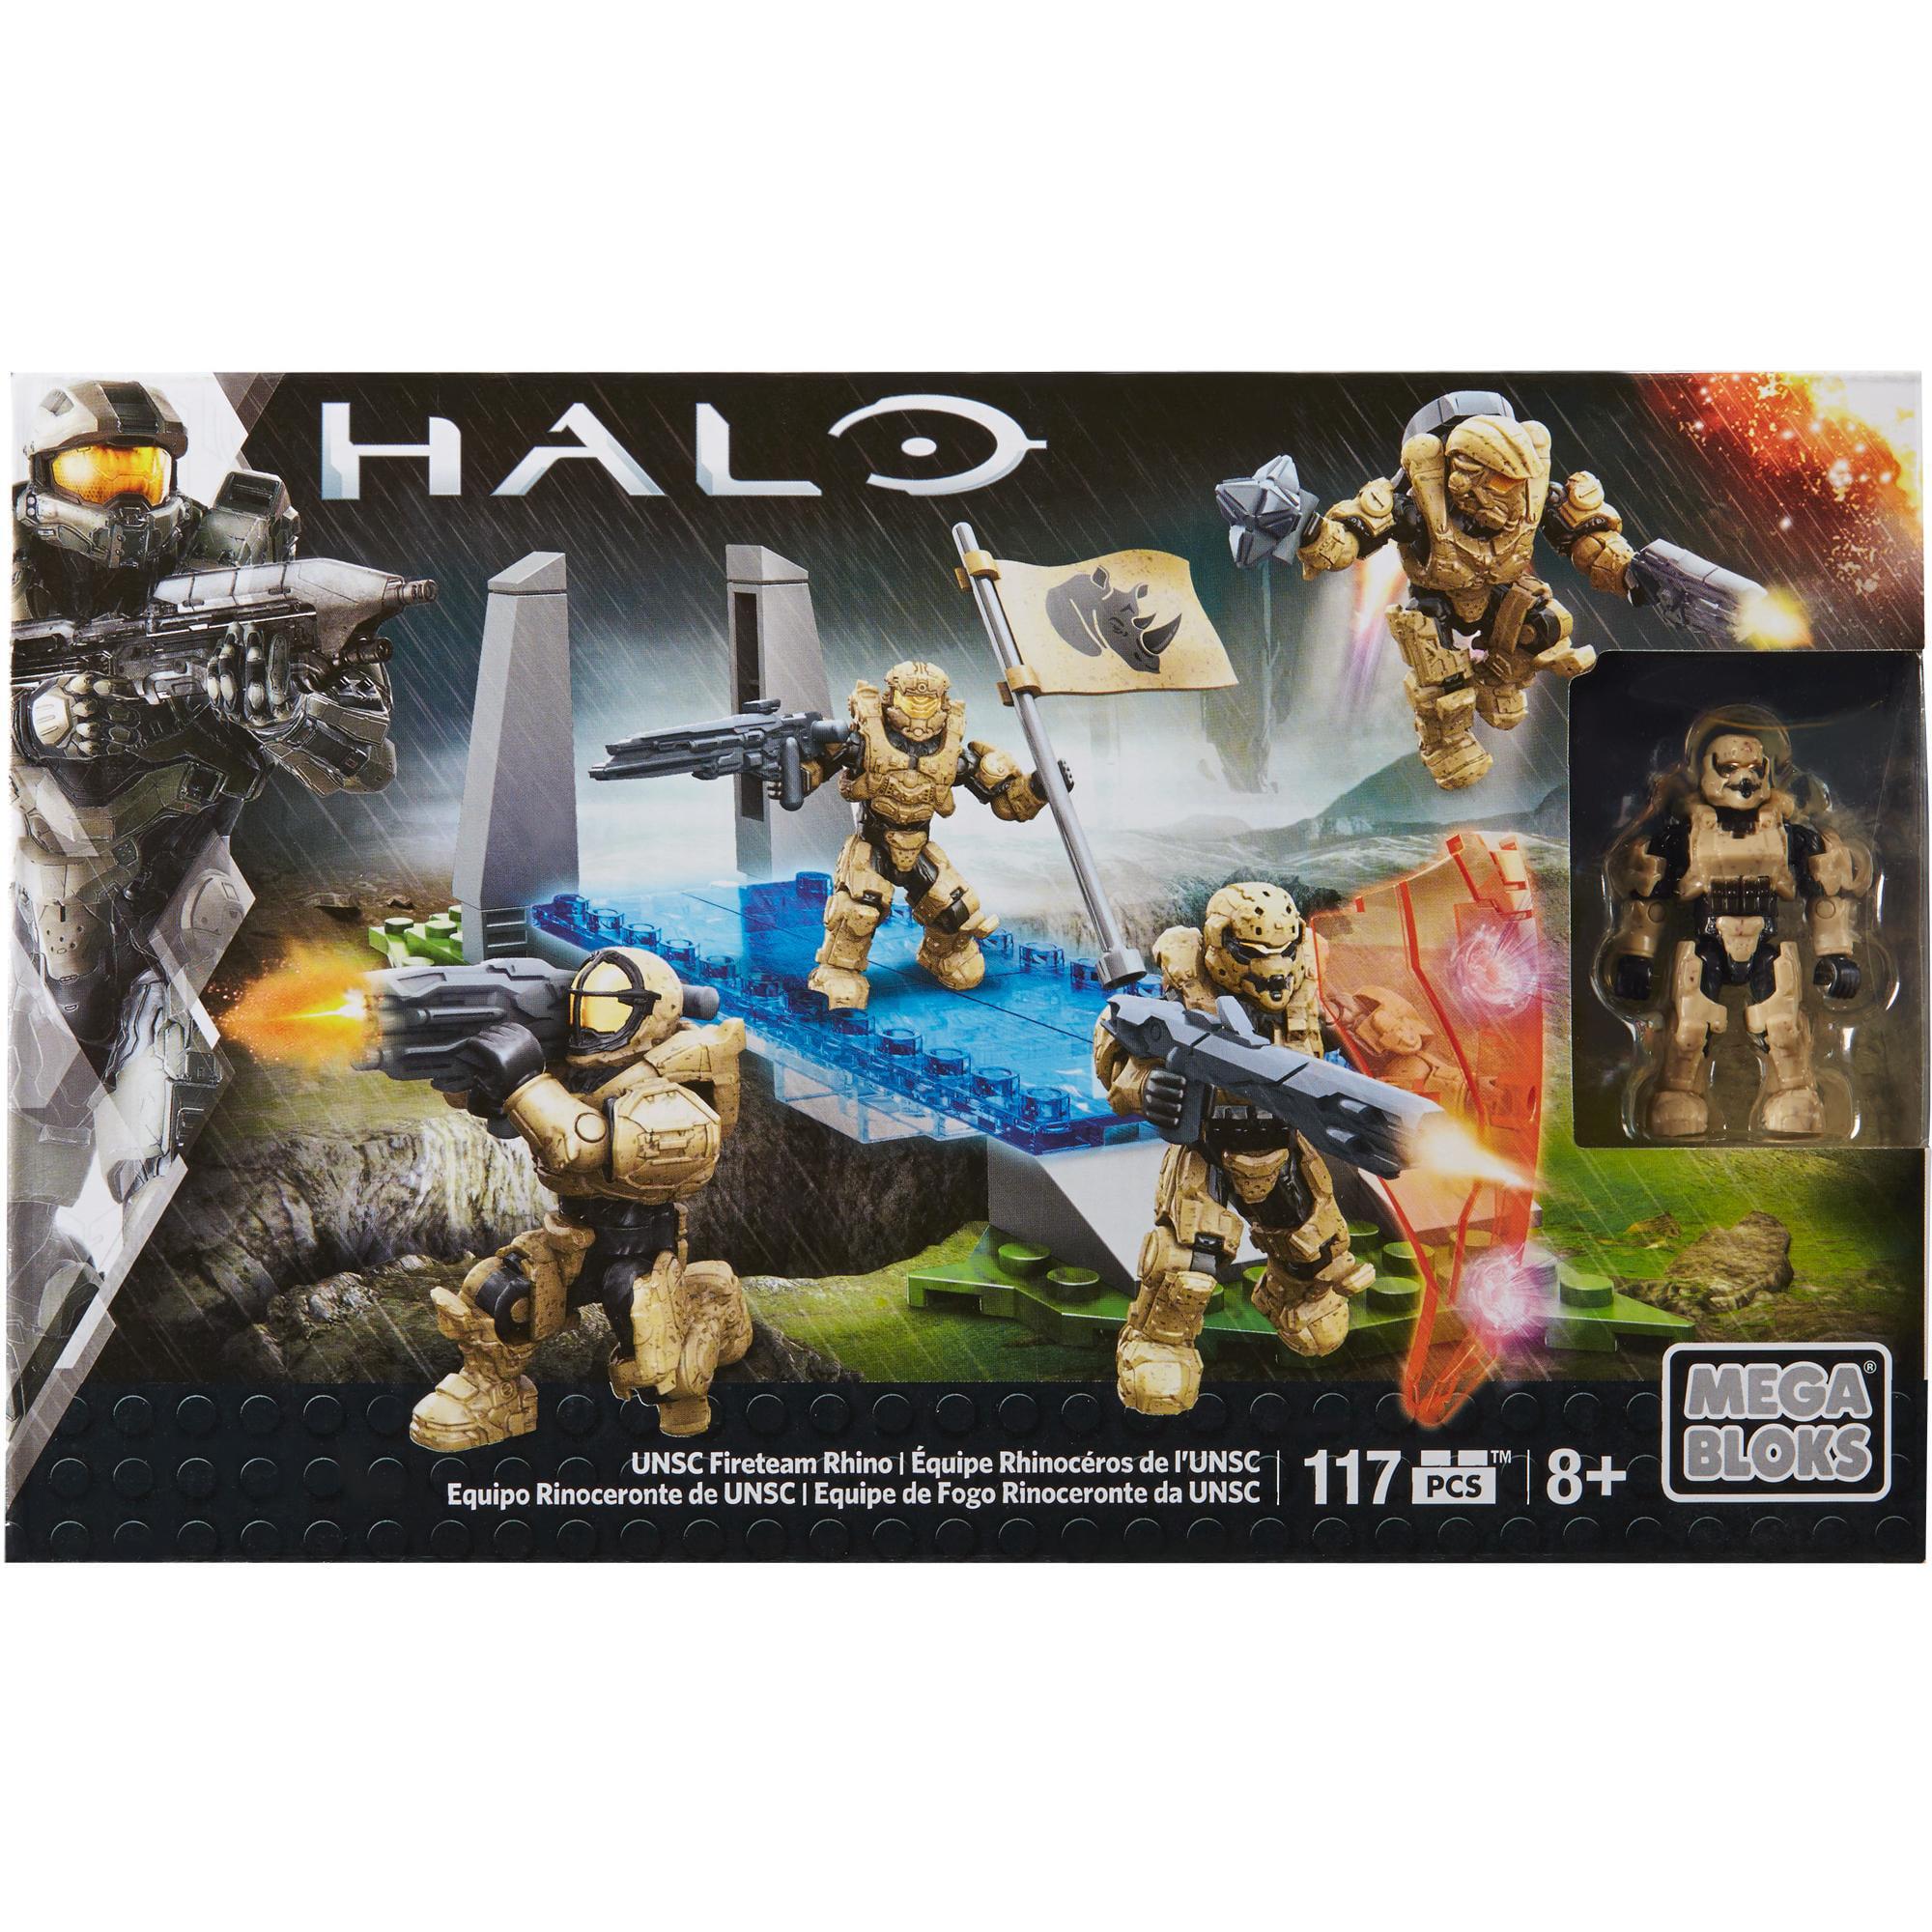 Mega Bloks Halo UNSC Fireteam Rhino